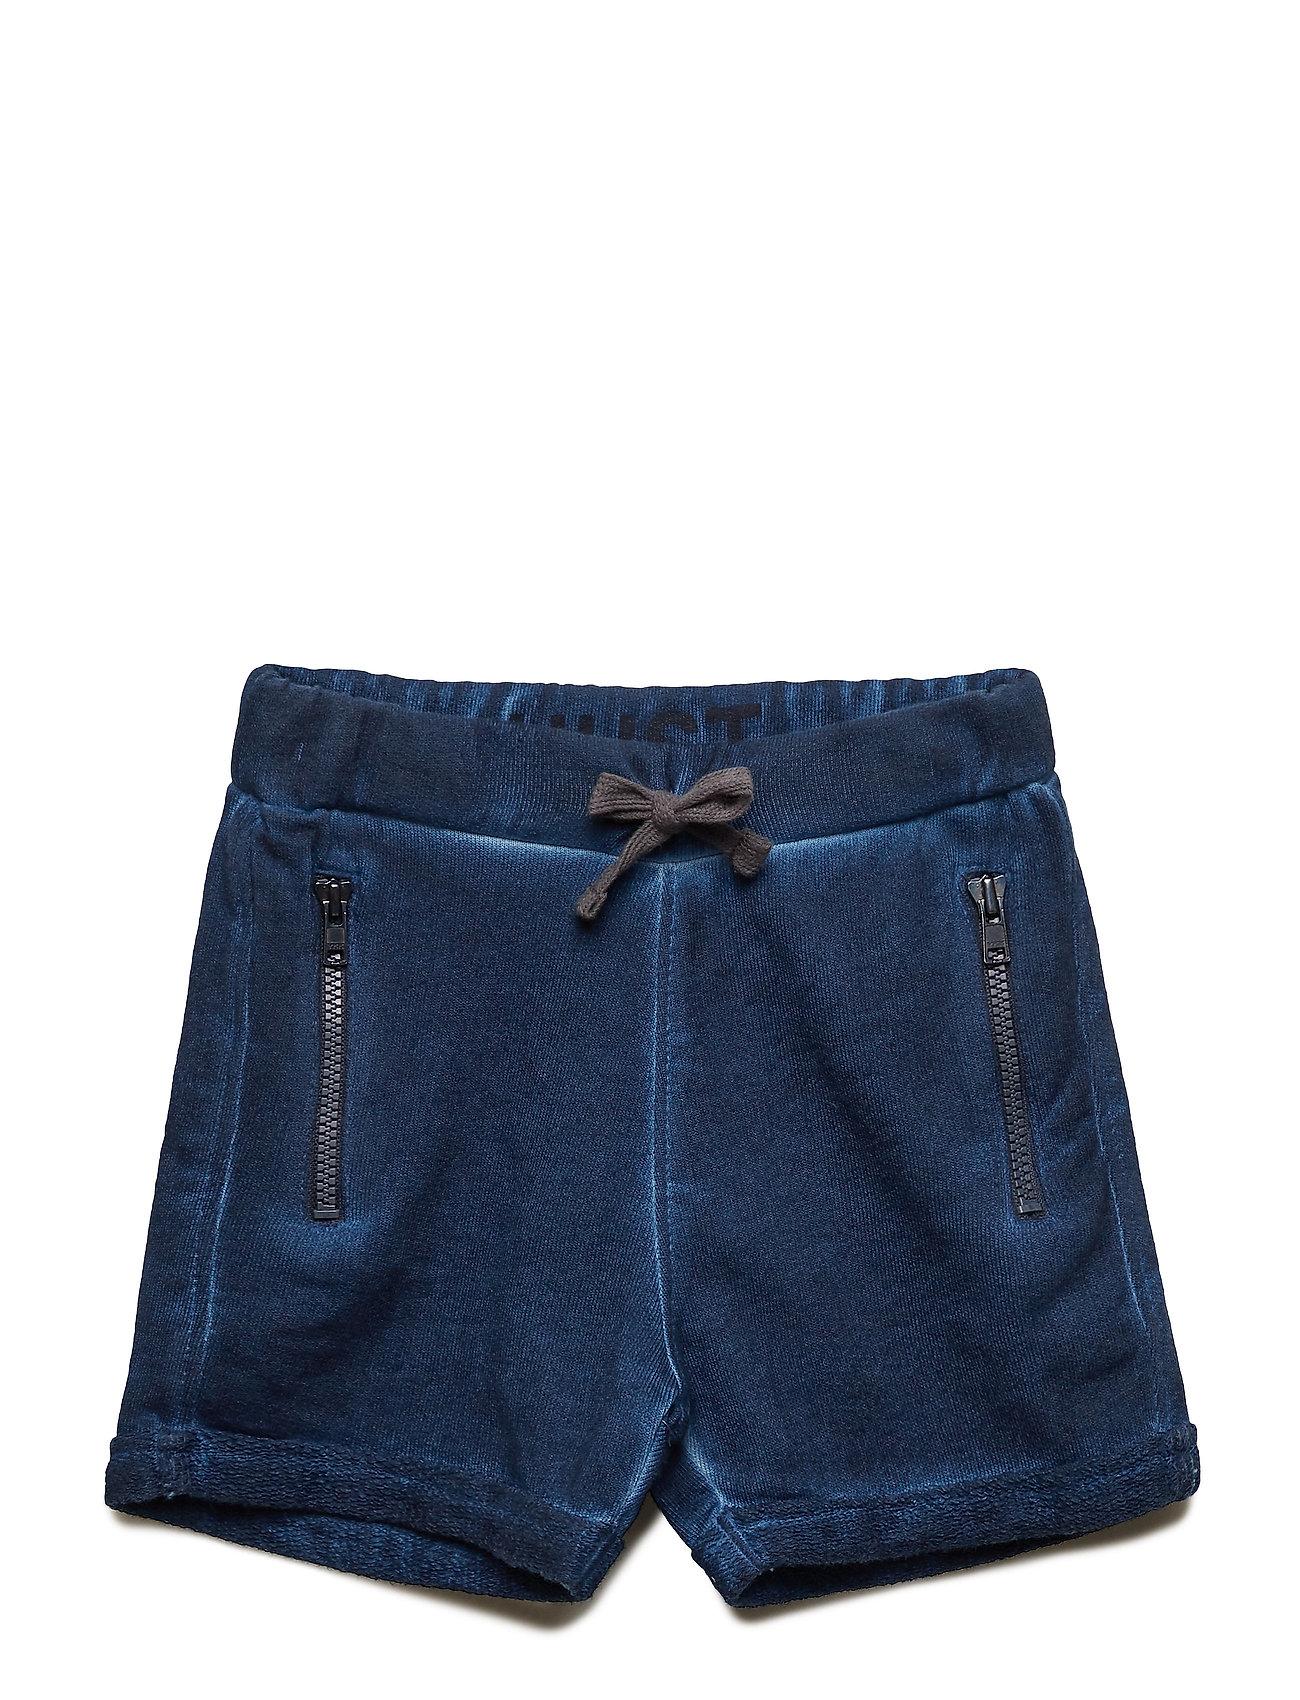 Hust & Claire Hugo - Shorts - BLUE MOON